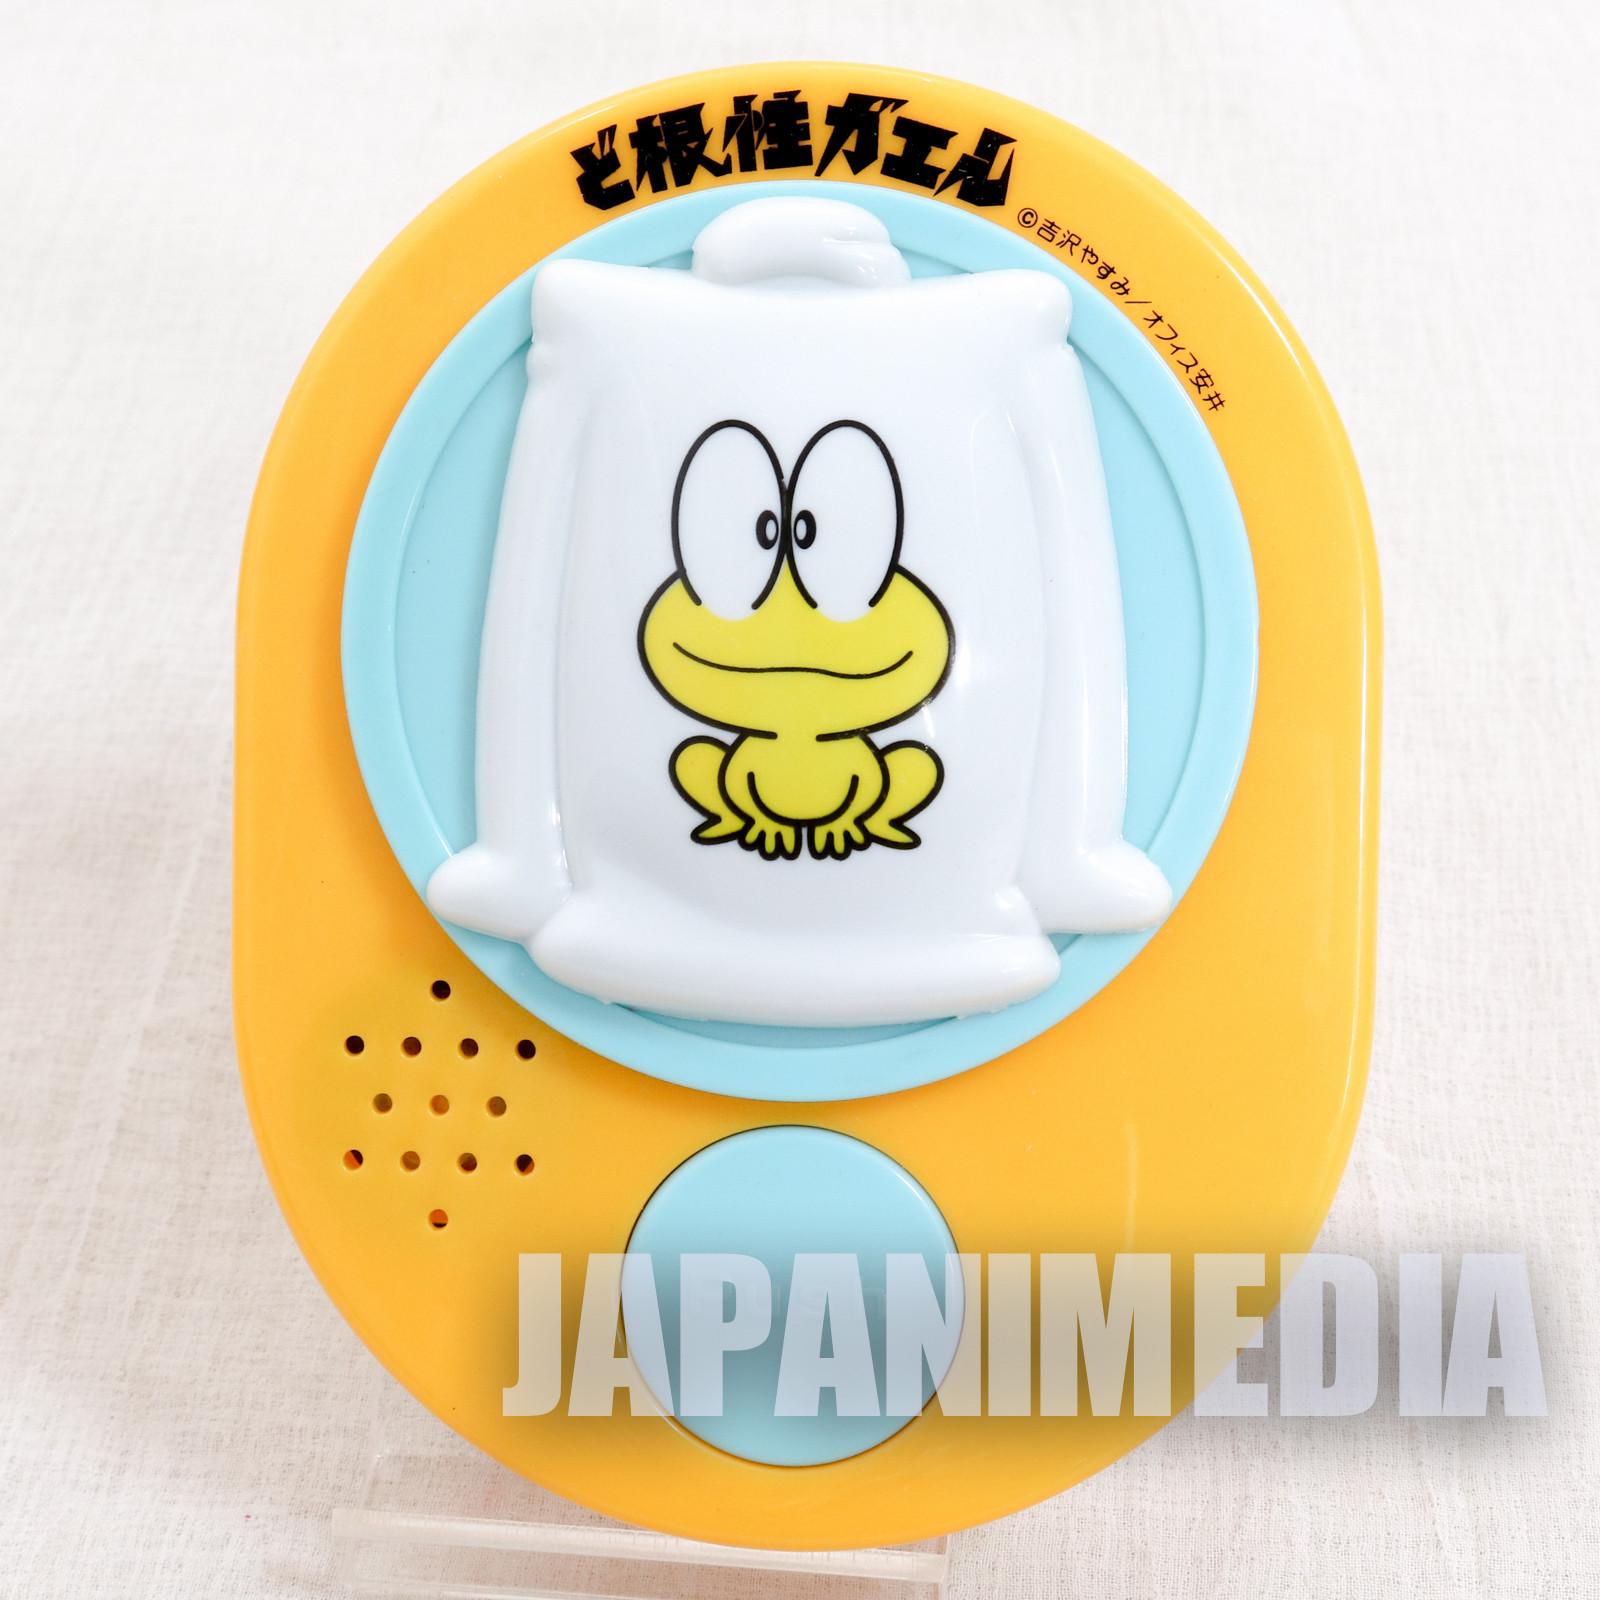 Retro Dokonjo Gaeru Room Chime Toy SK Japan MANGA